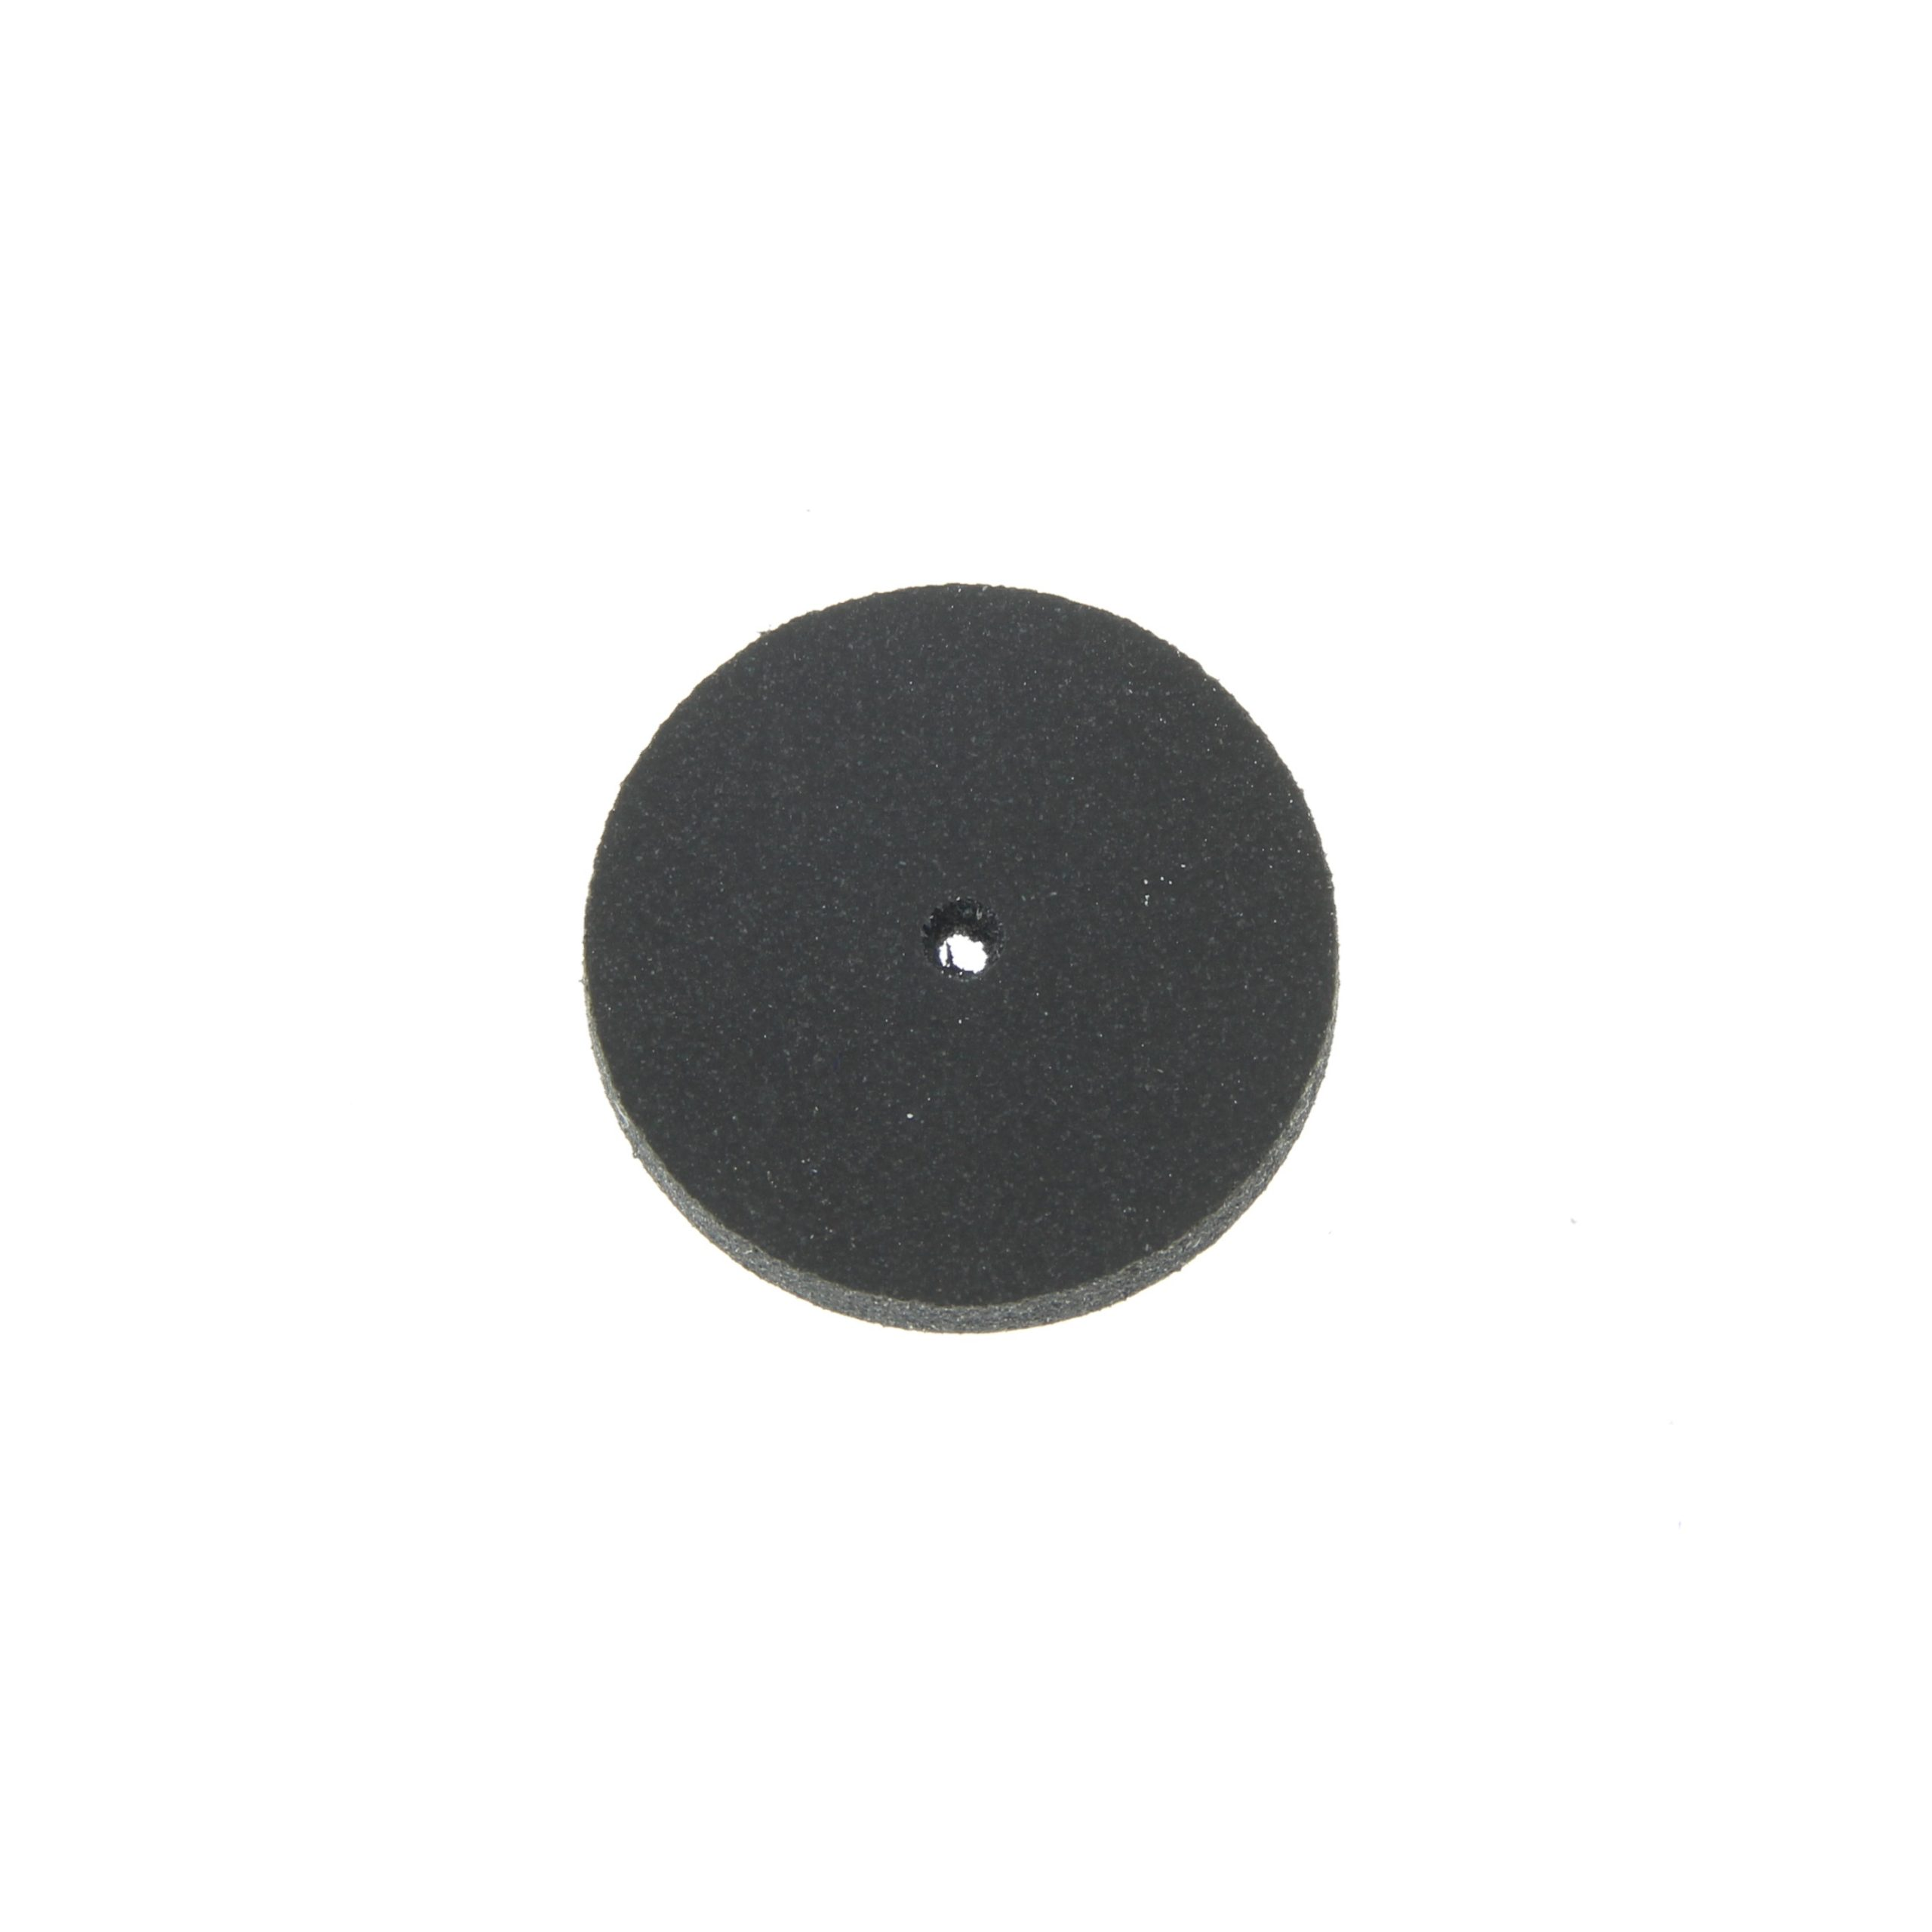 Резинка чёрная б/д шайба 22х3 мм R22m